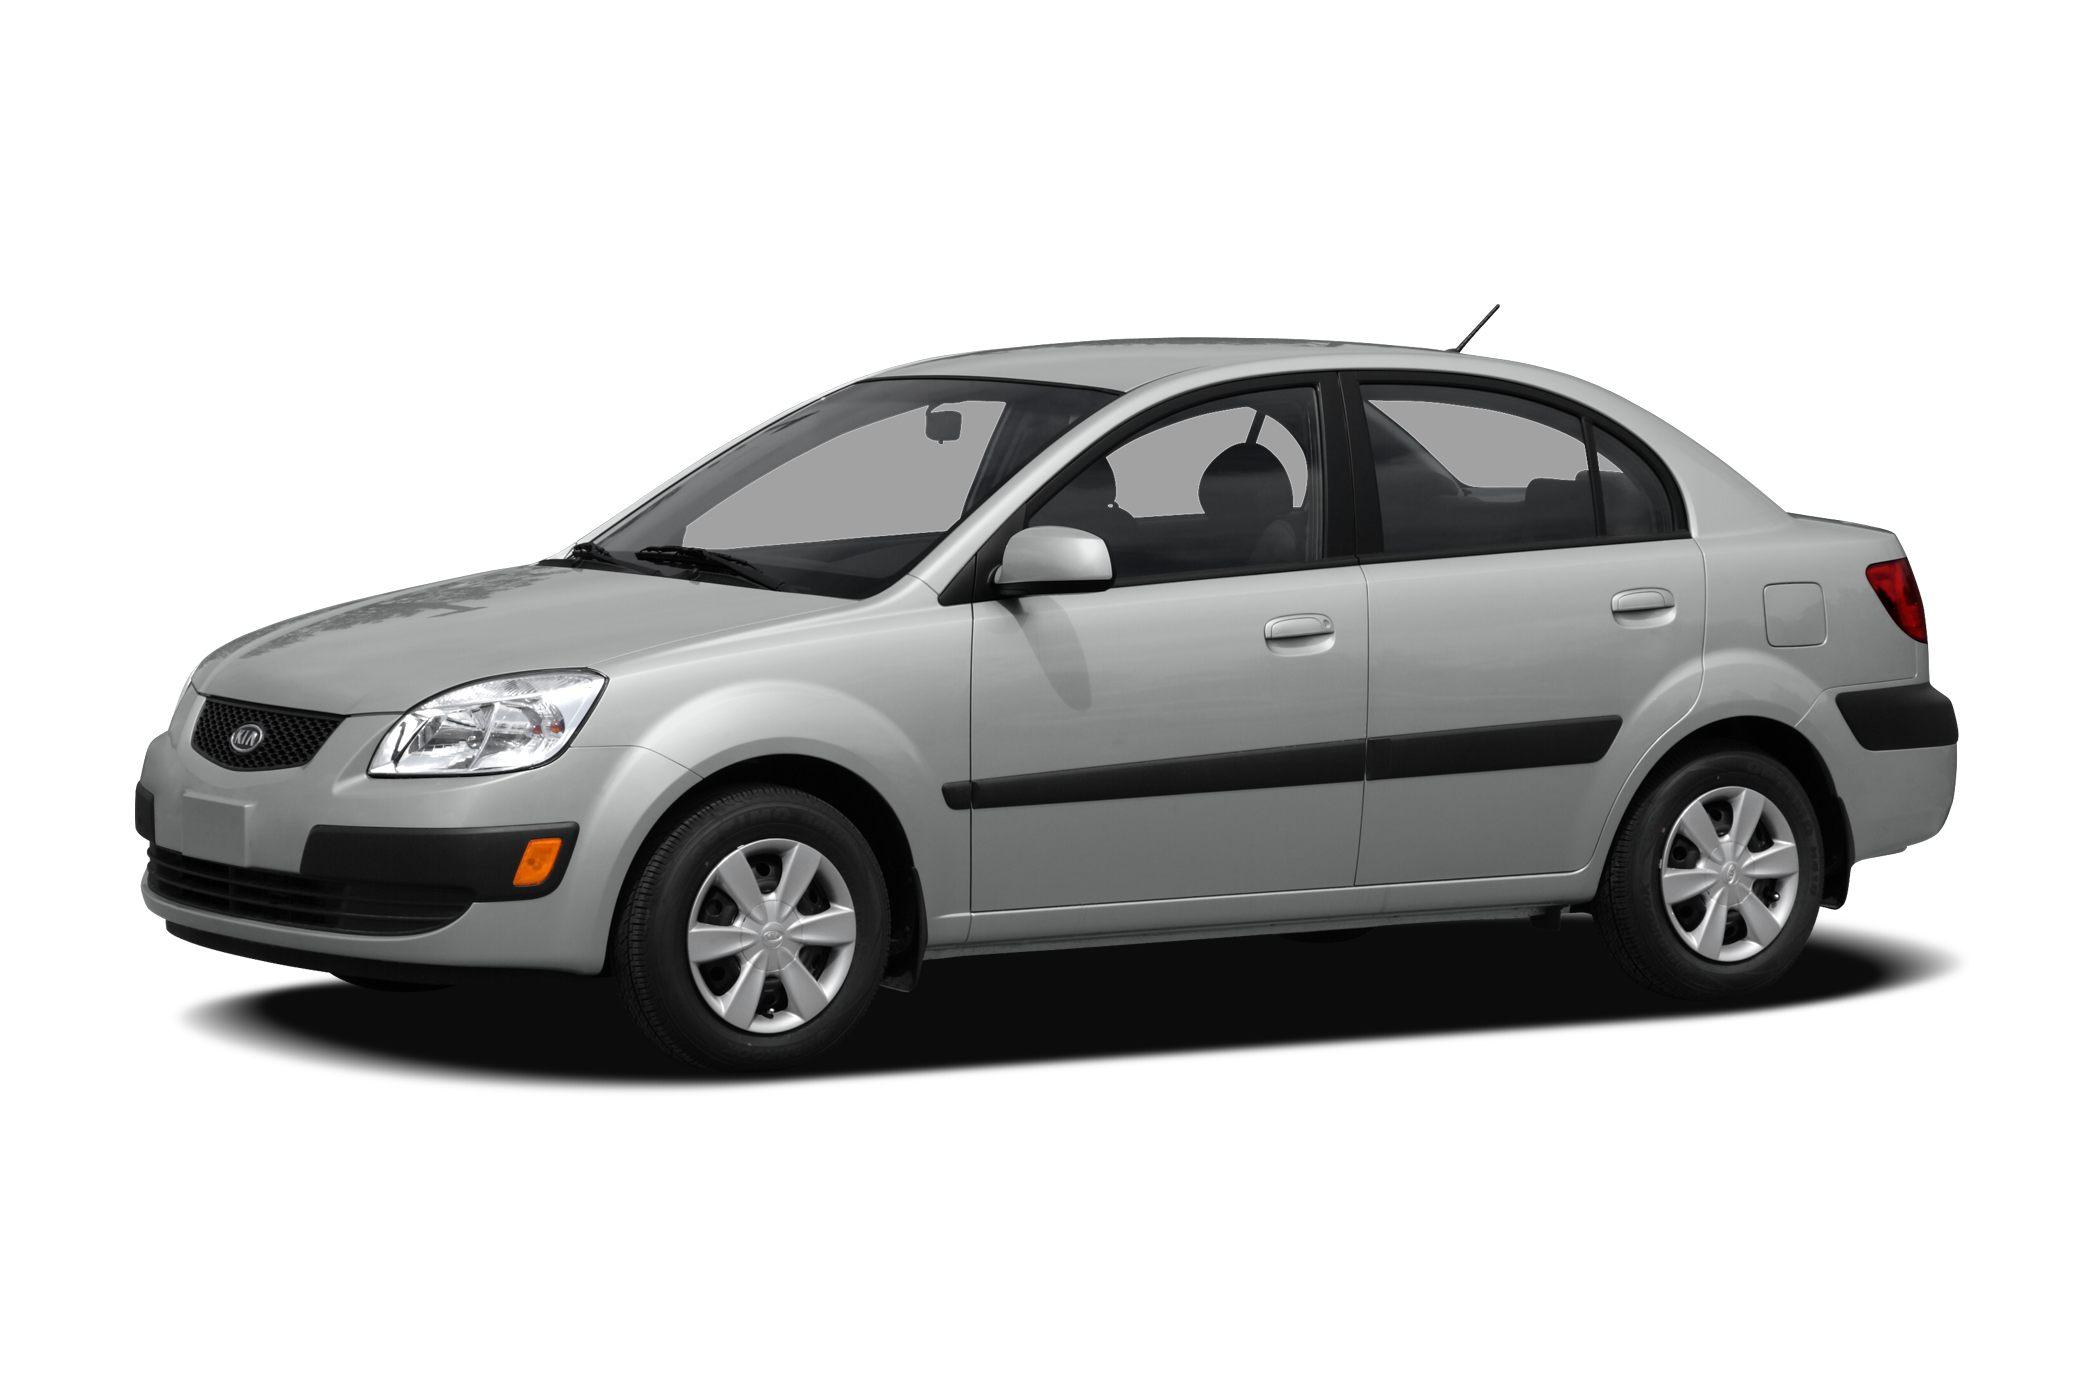 2006 Kia Rio Sedan for sale in Columbus for $3,694 with 150,274 miles